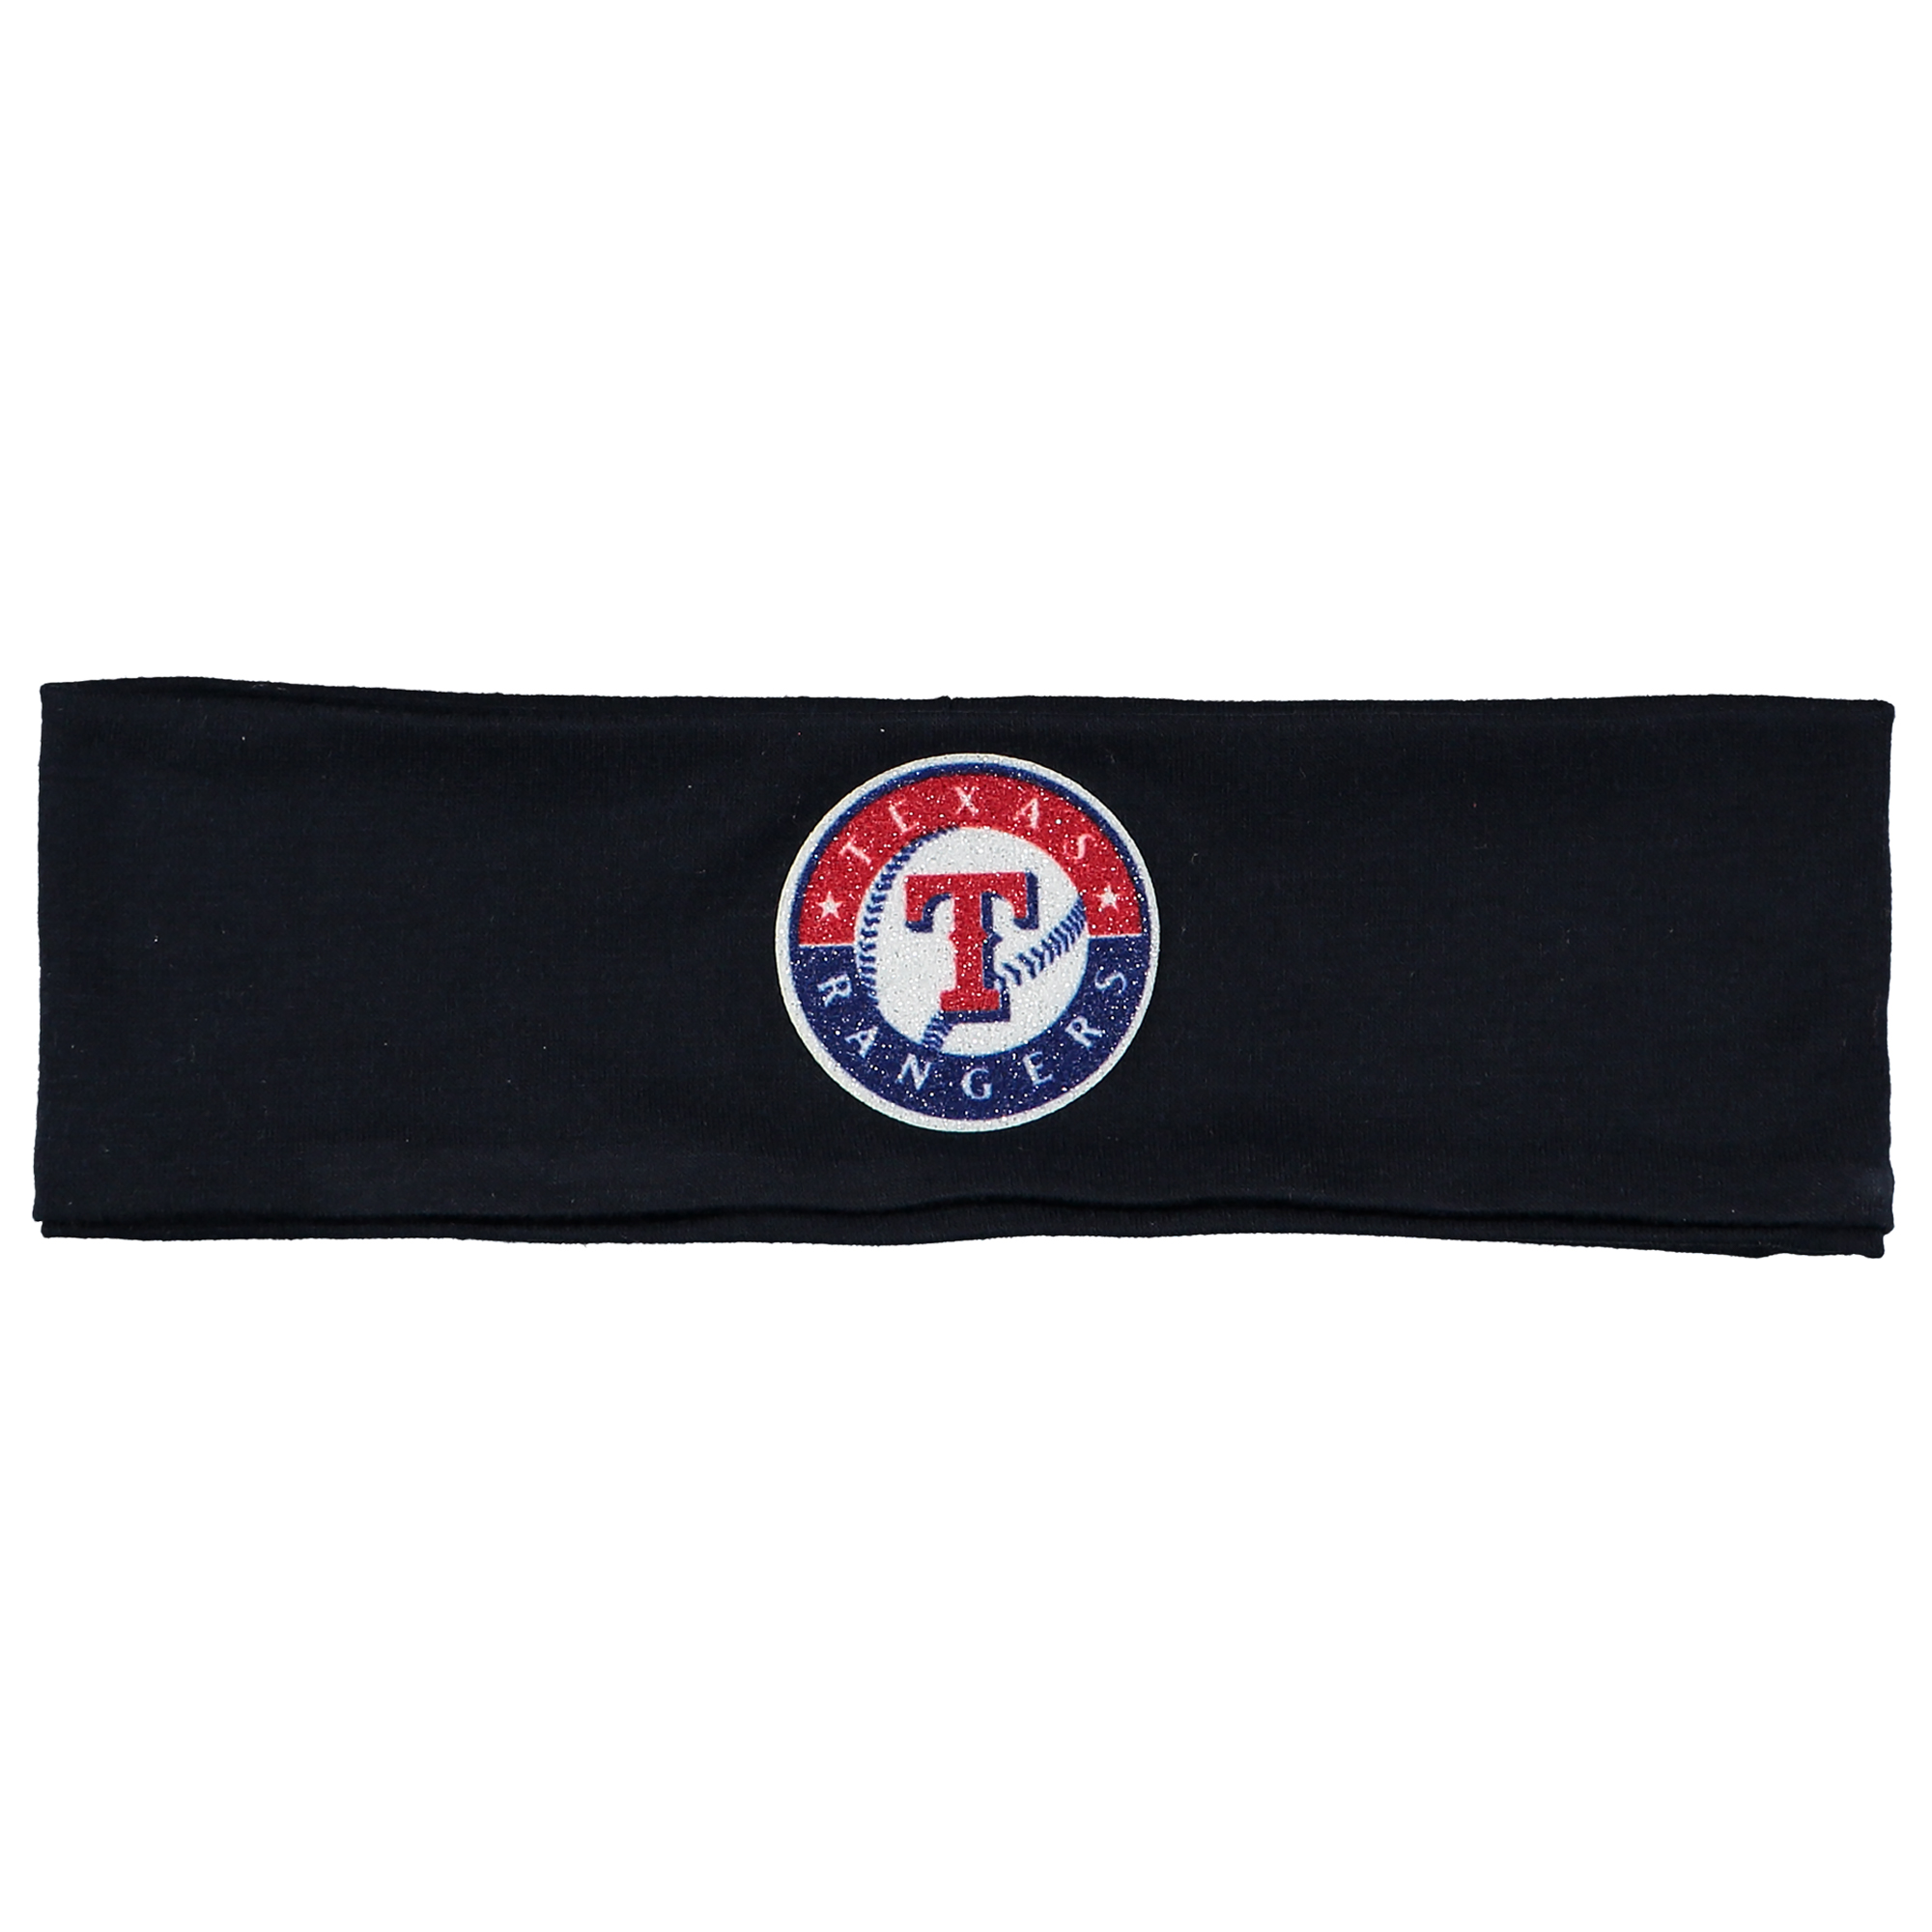 Texas Rangers Women's Stretch Headband - No Size